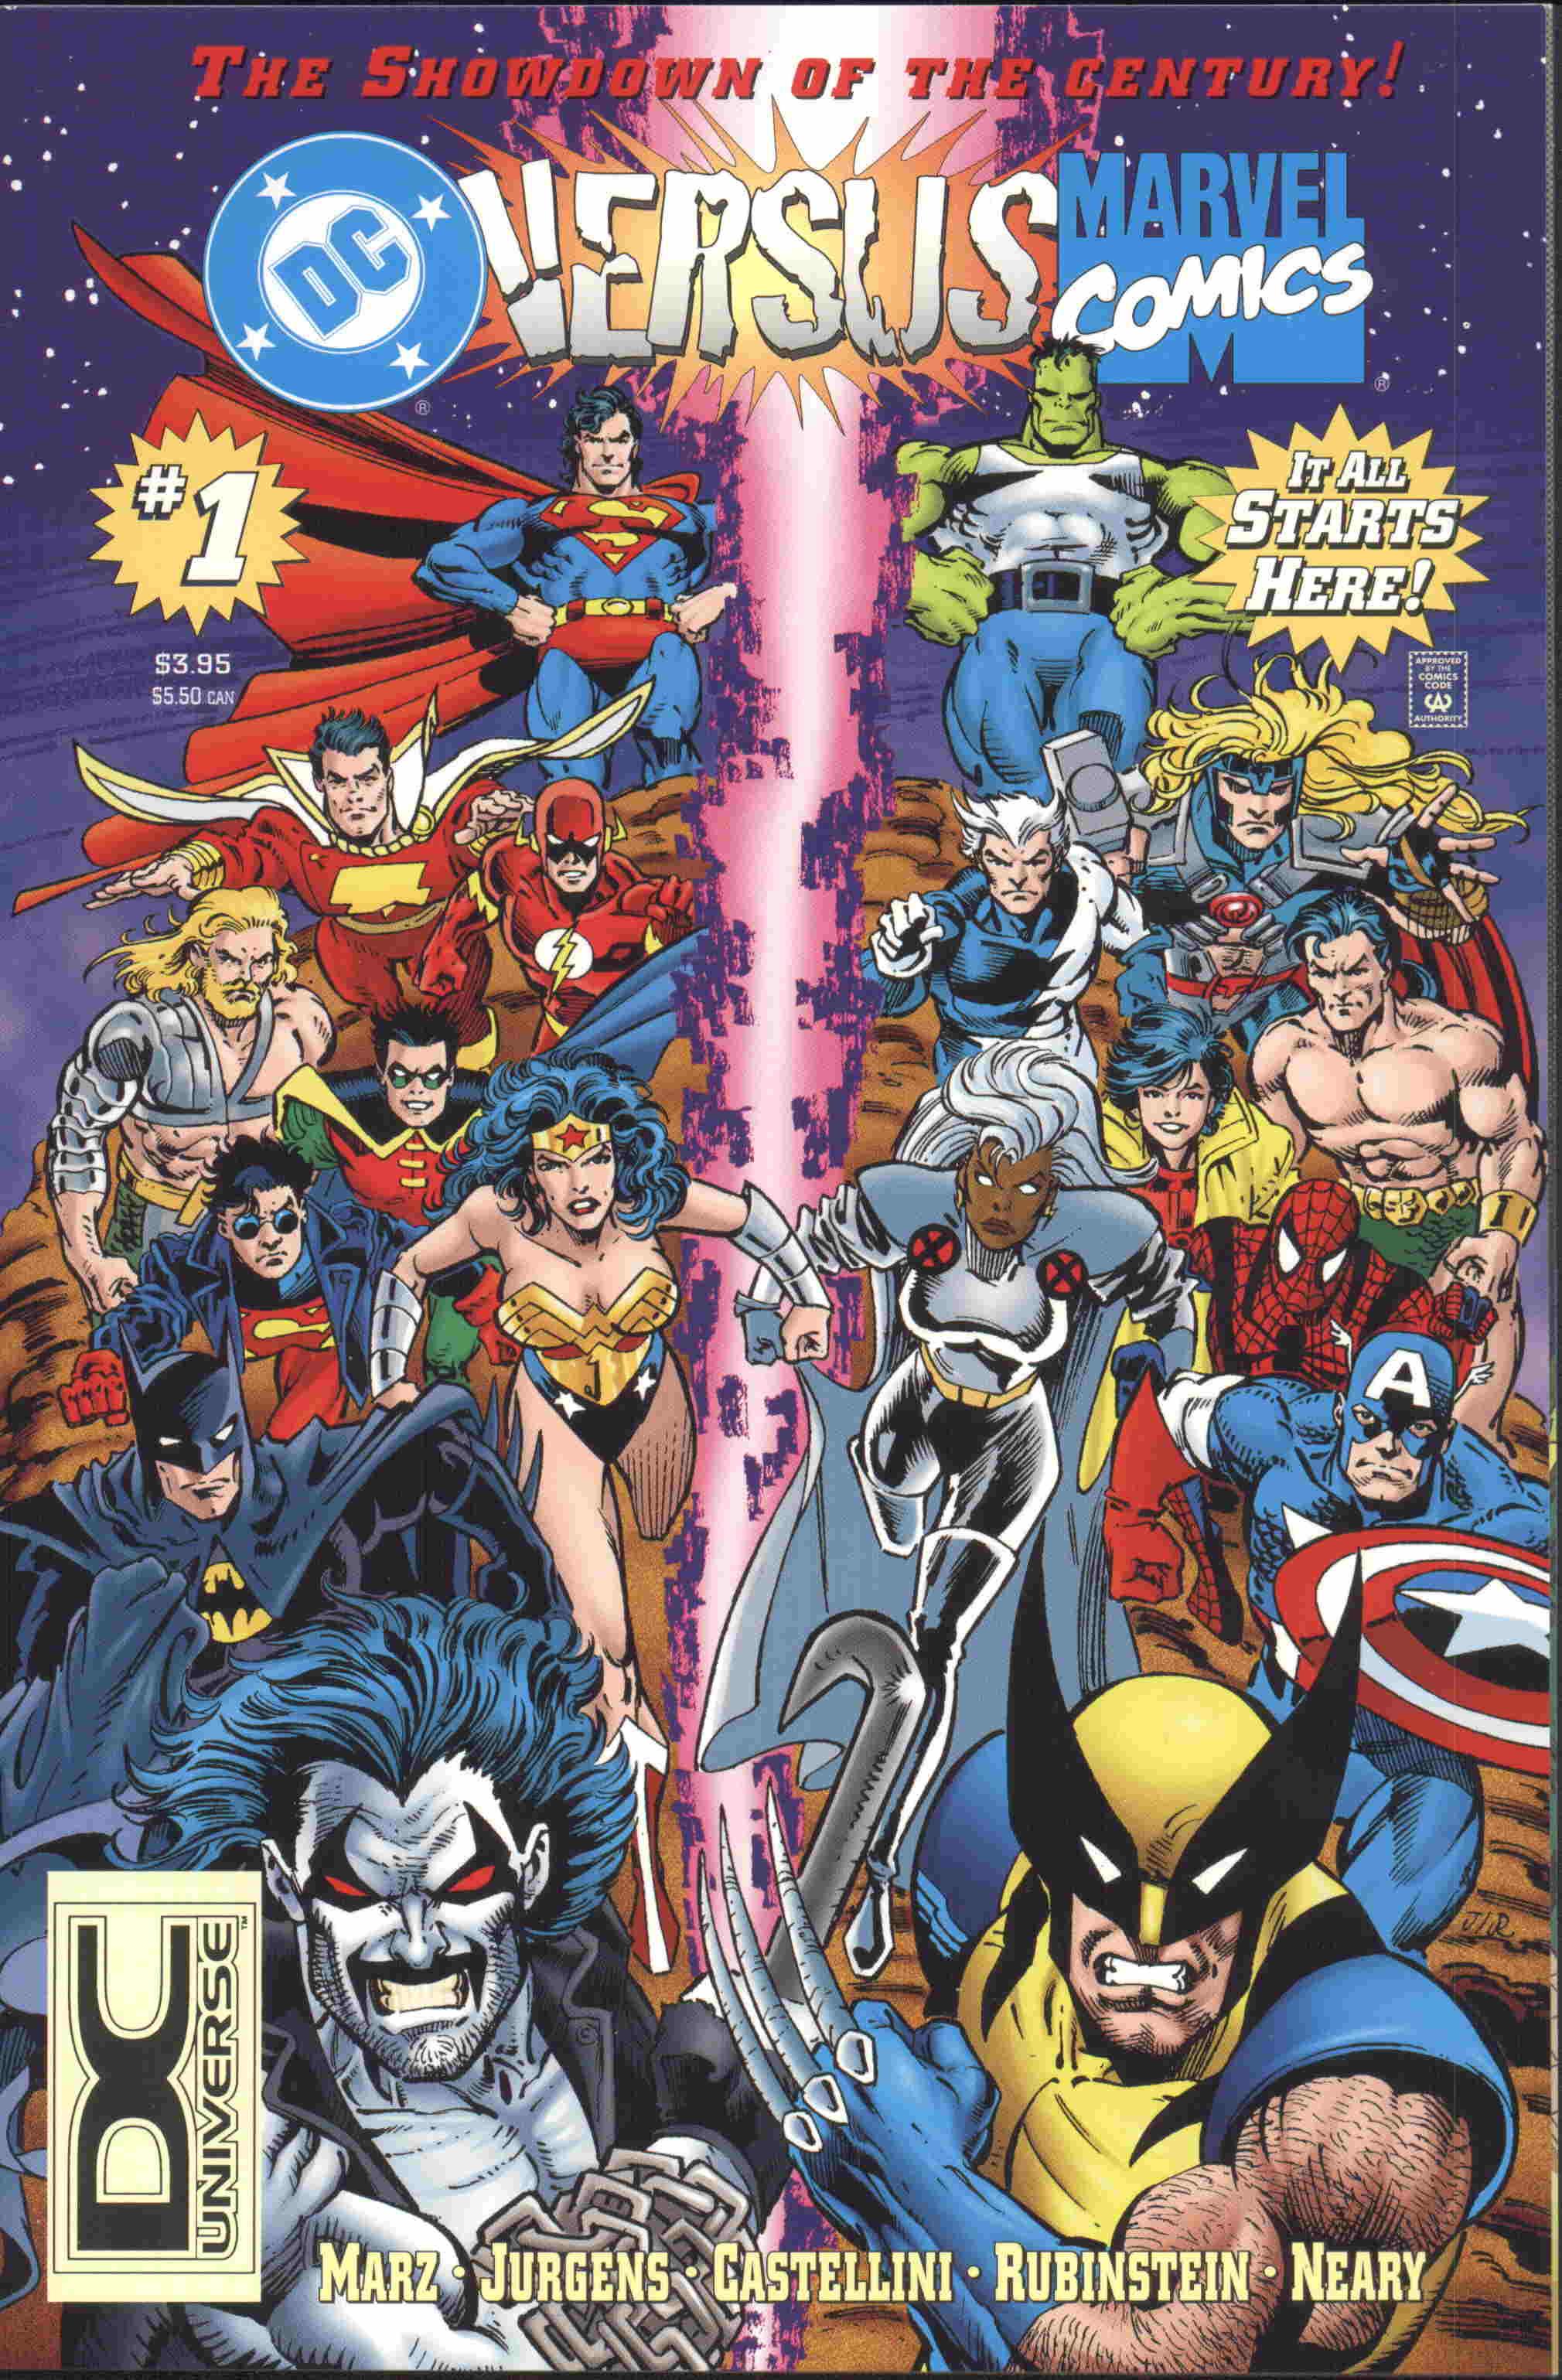 Nace DC Entertainment. Reestructuración DC Comics: